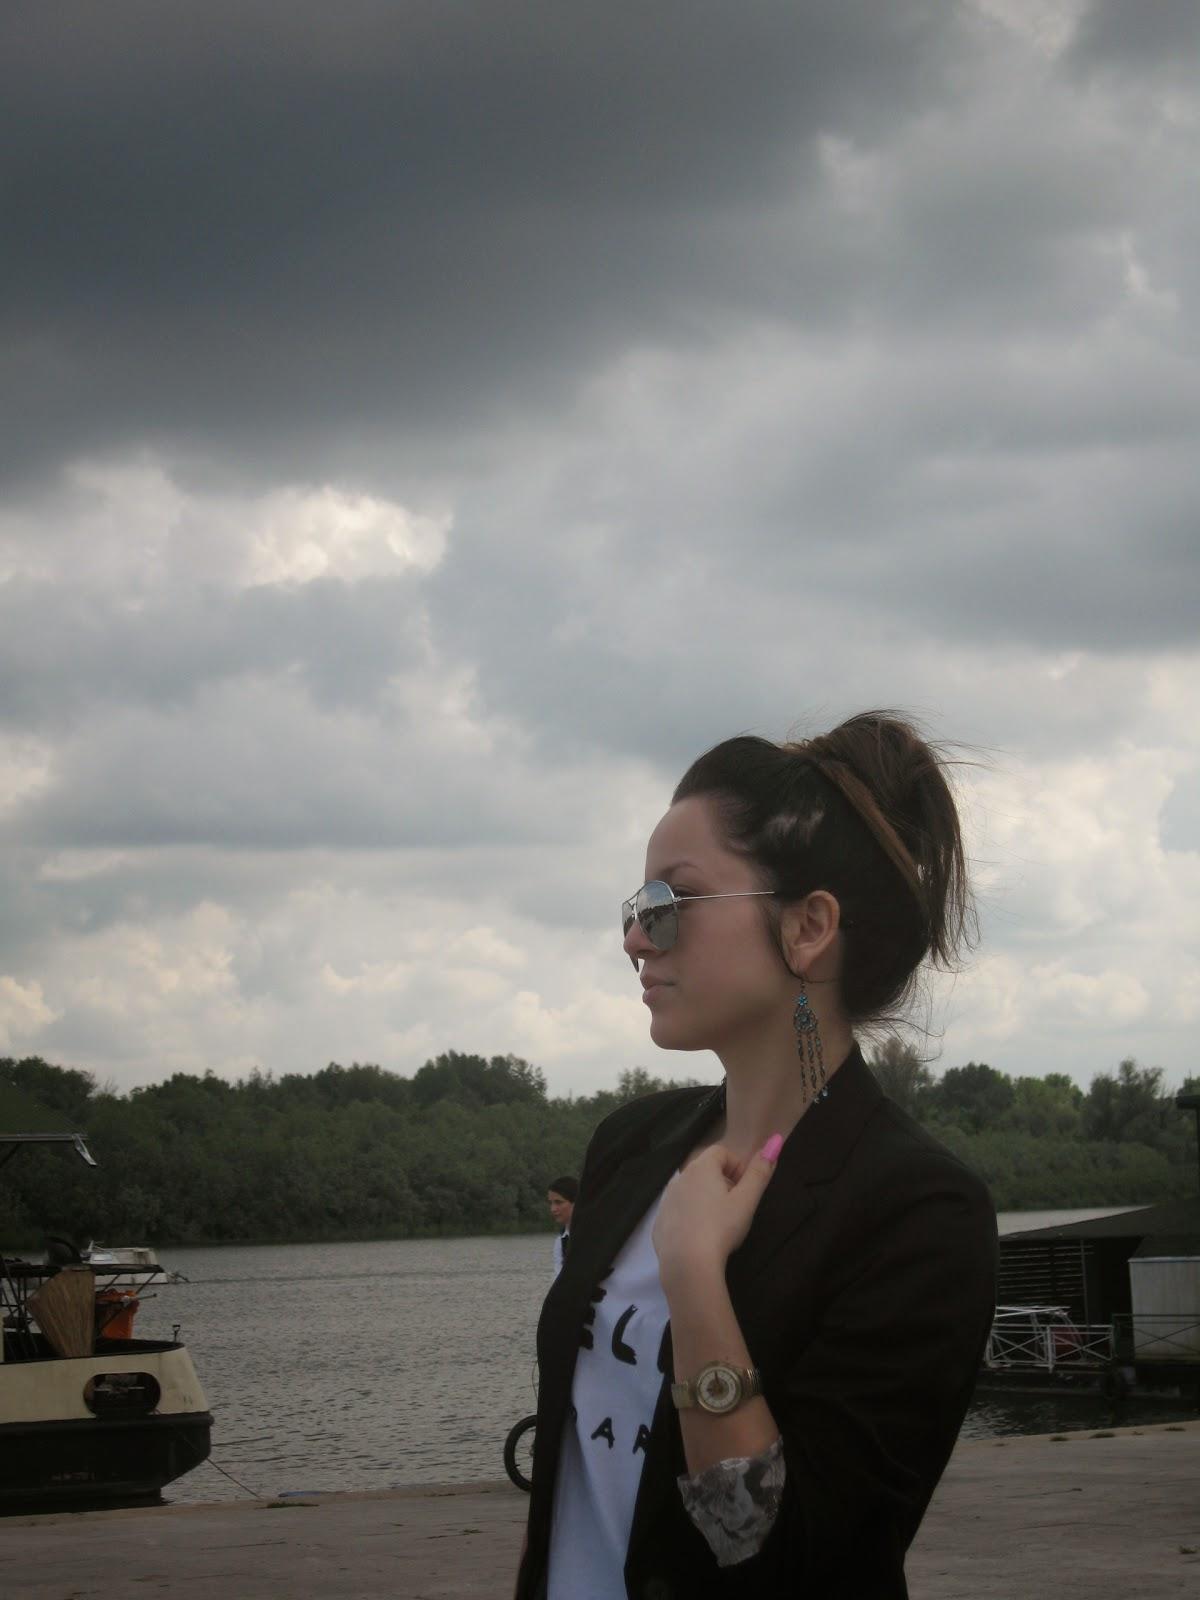 black H&M blazer, bershka jeans, celine t-shirt, swatch watch, black pointy flats, casual look, go-to look, messy bun, aviator sunglasses